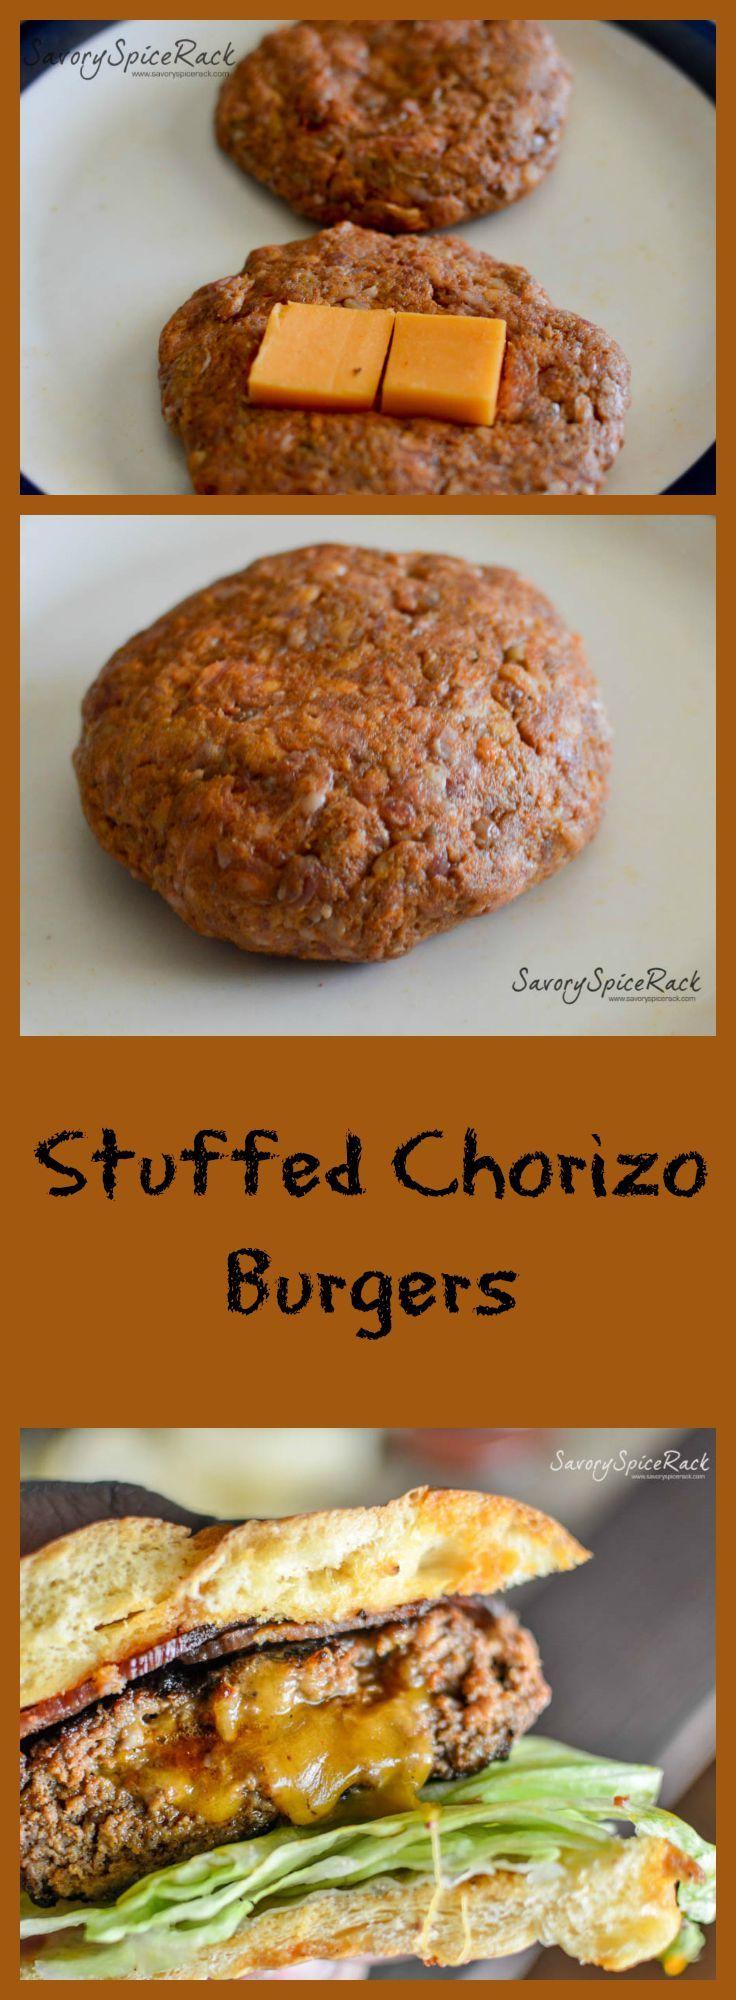 Stuffed Chorizo Burgers. Chorizo burgers seasoned with homemade cajun seasoning and stuffed with cheeses